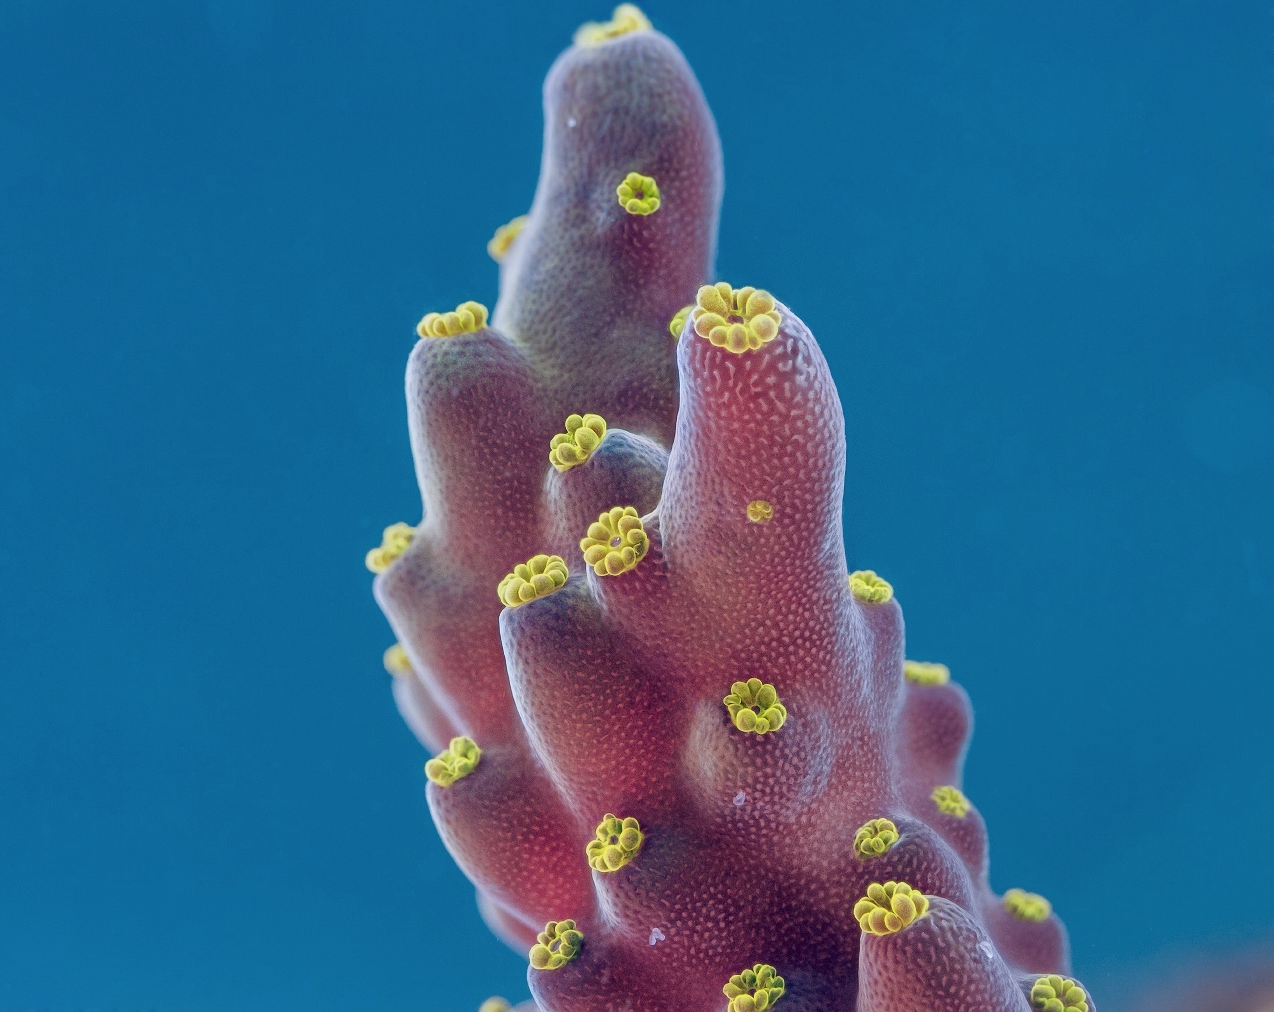 Coral by Daniel Stoupin